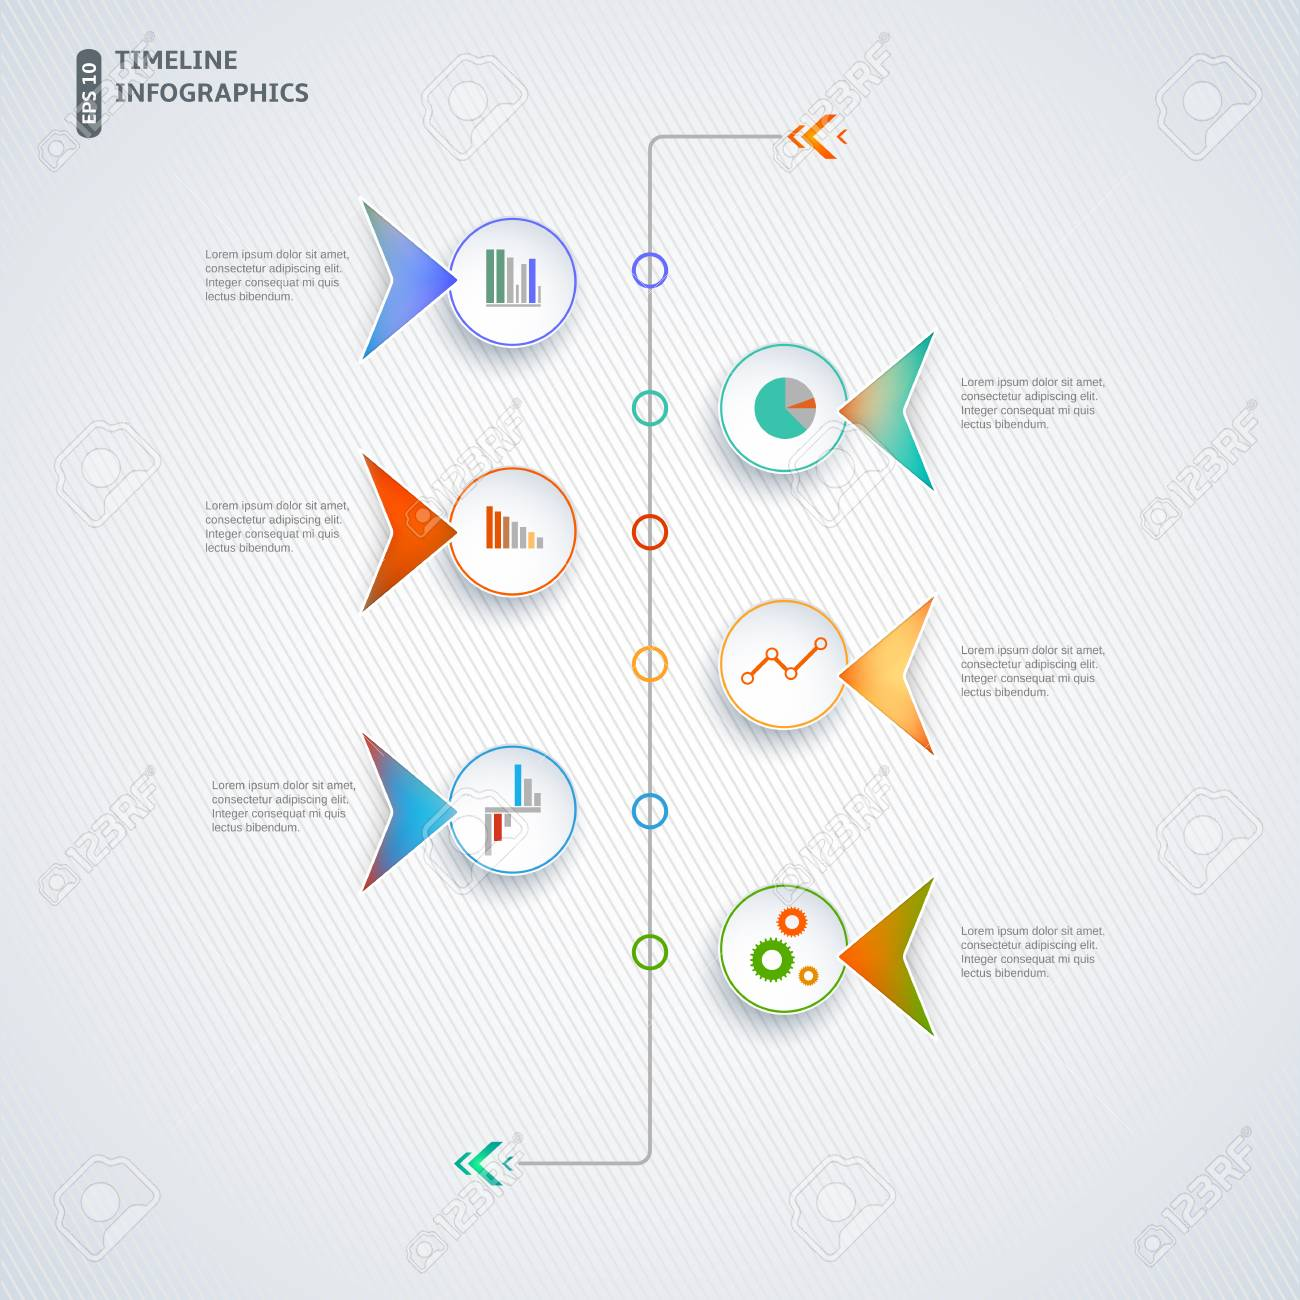 Schön Website Design Timeline Vorlage Bilder - Entry Level Resume ...